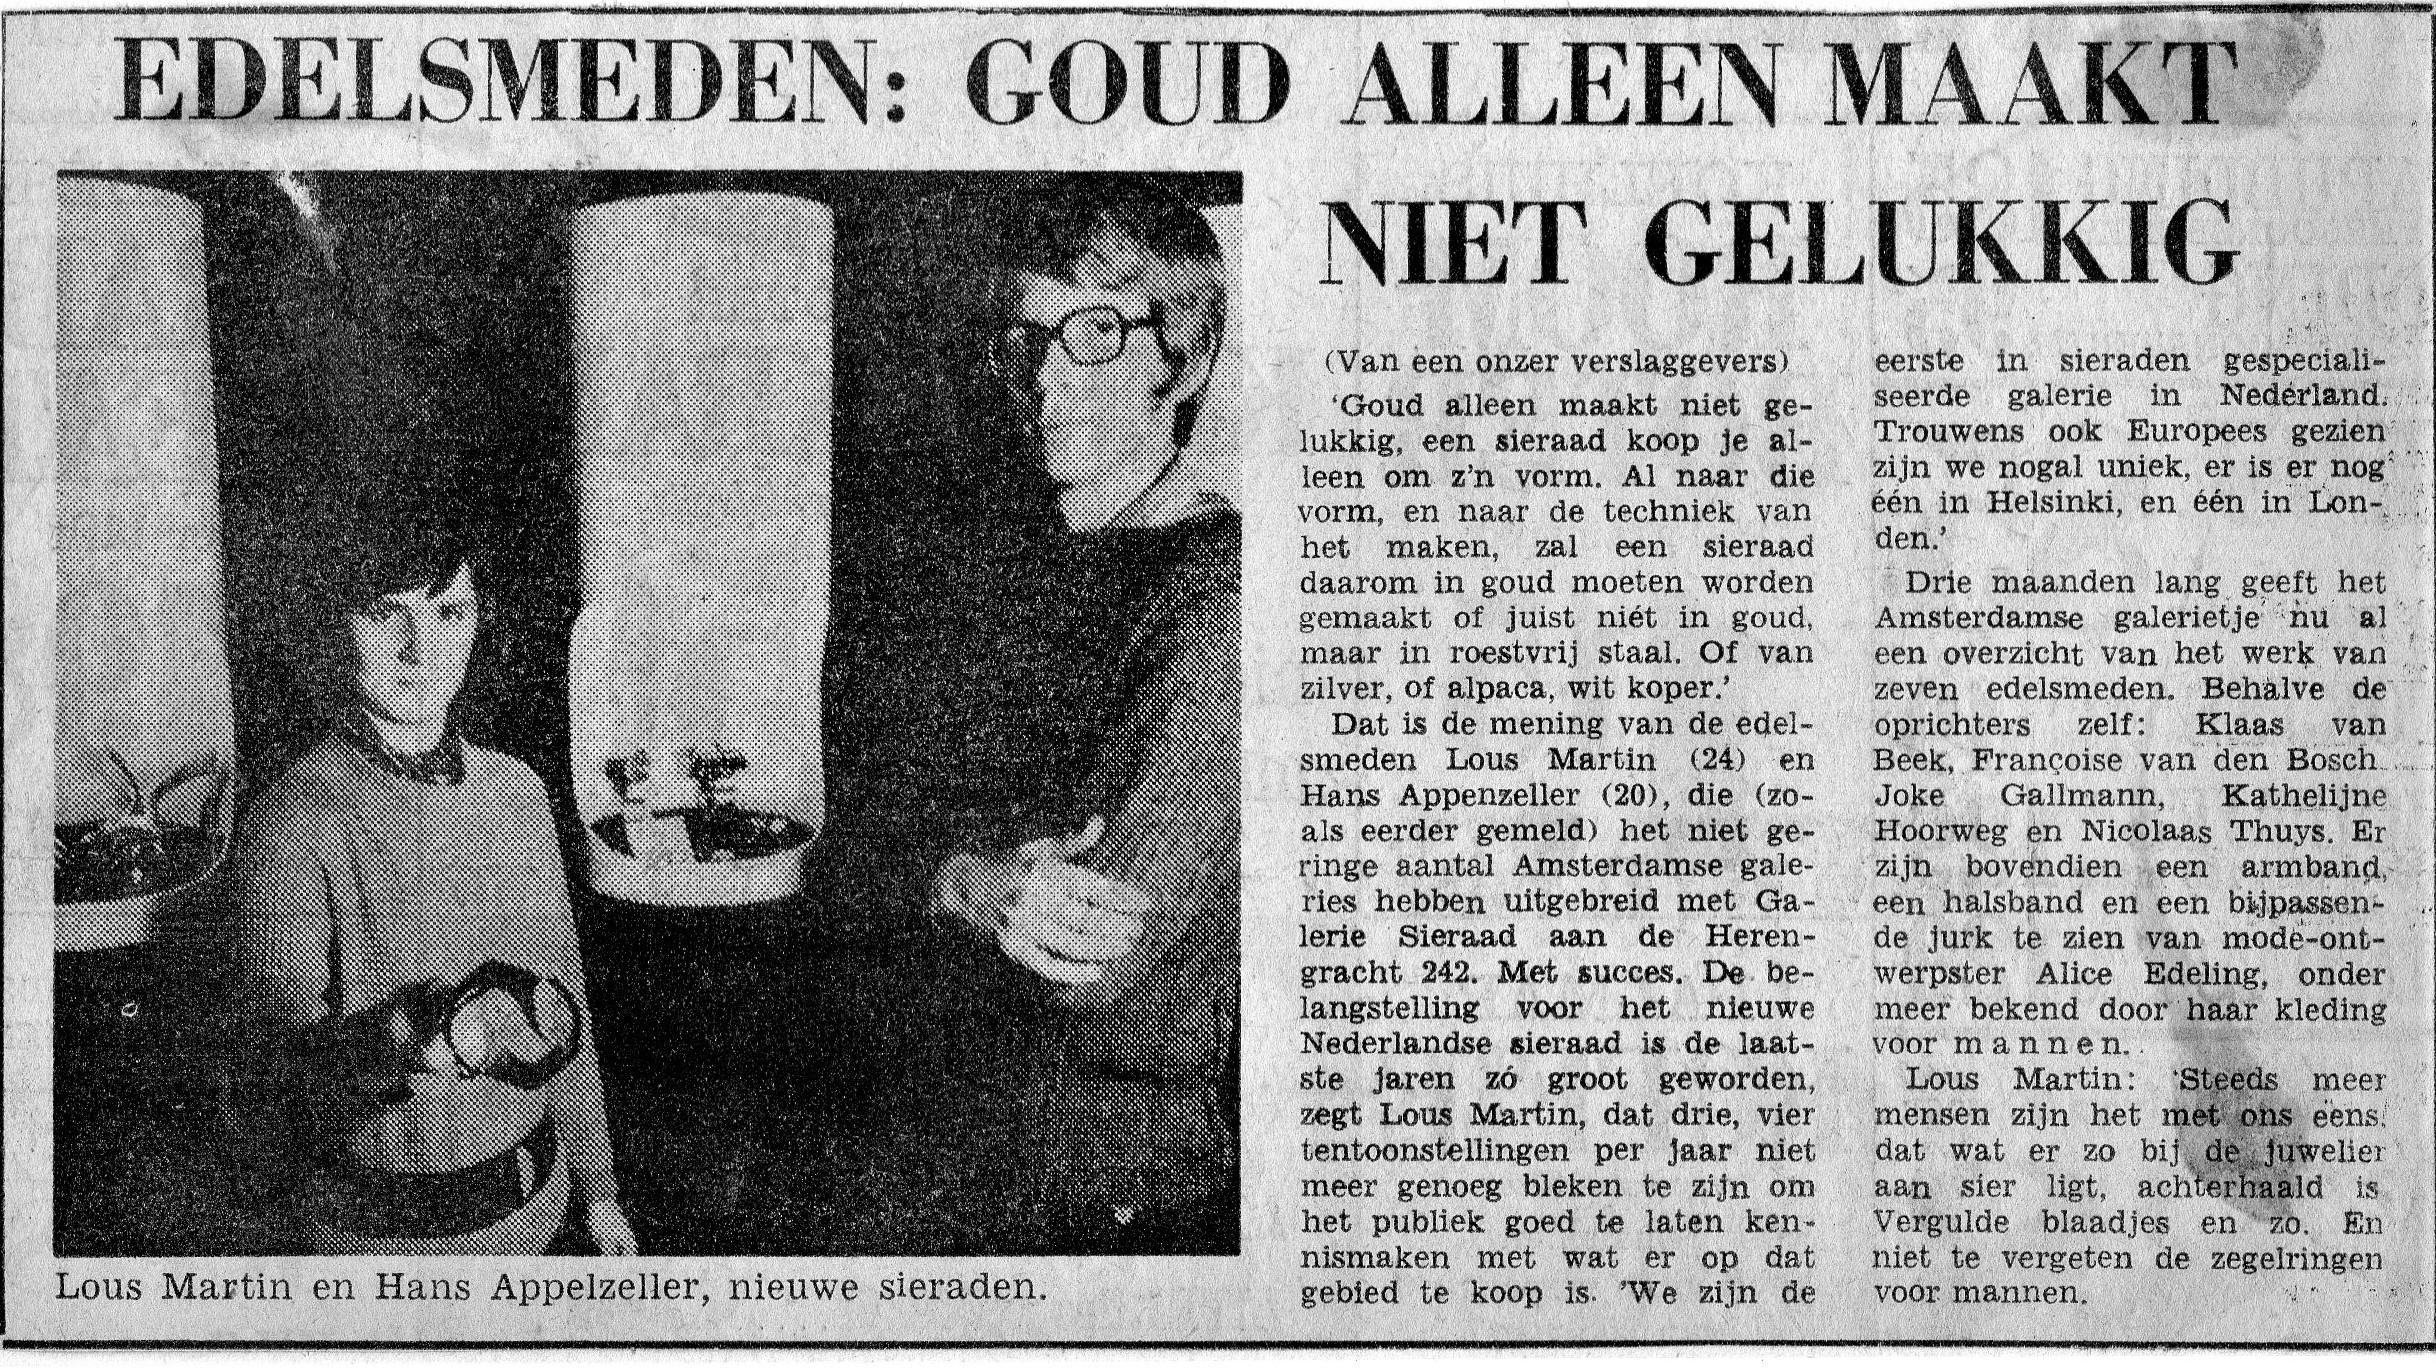 Kranteartikel over Galerie Sierraad, foto met Lous Martin en Hans Appenzeller, portret